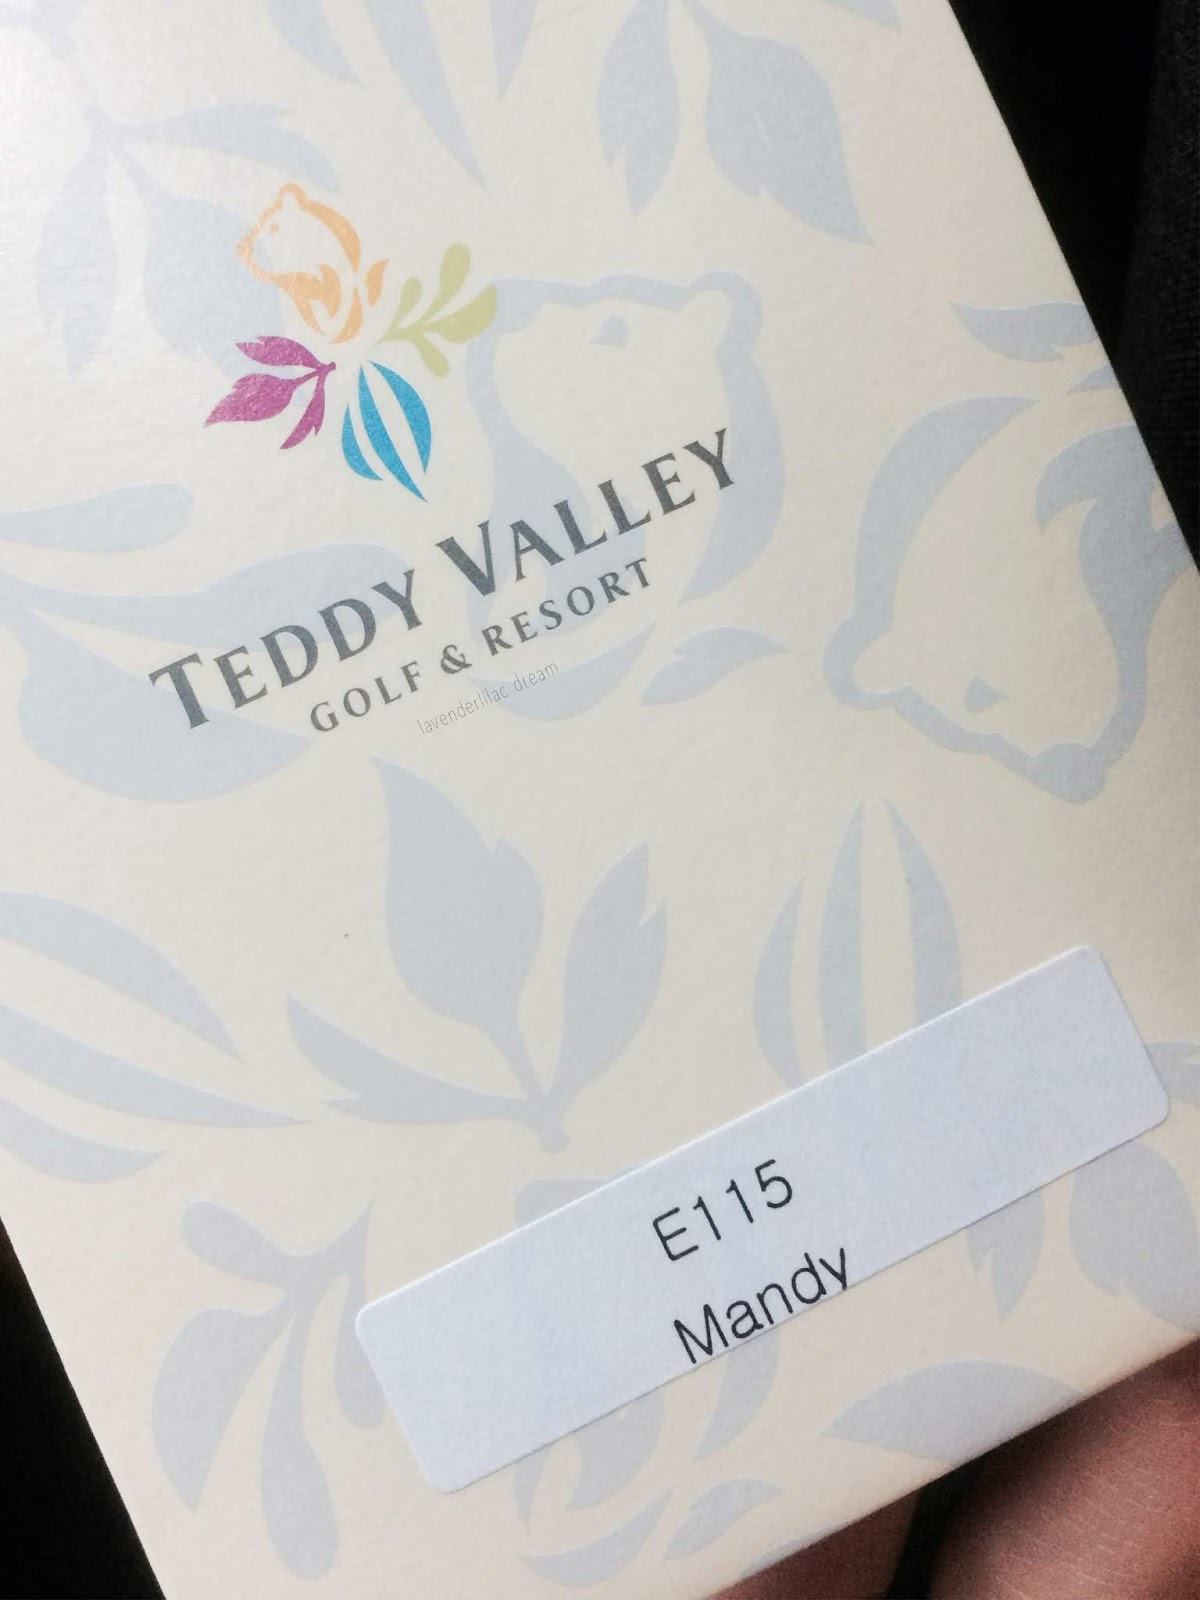 South Korea, Yonsei University, YISS 2014 Field Trip to Jeju Island, Teddy Valley Golf & Resort